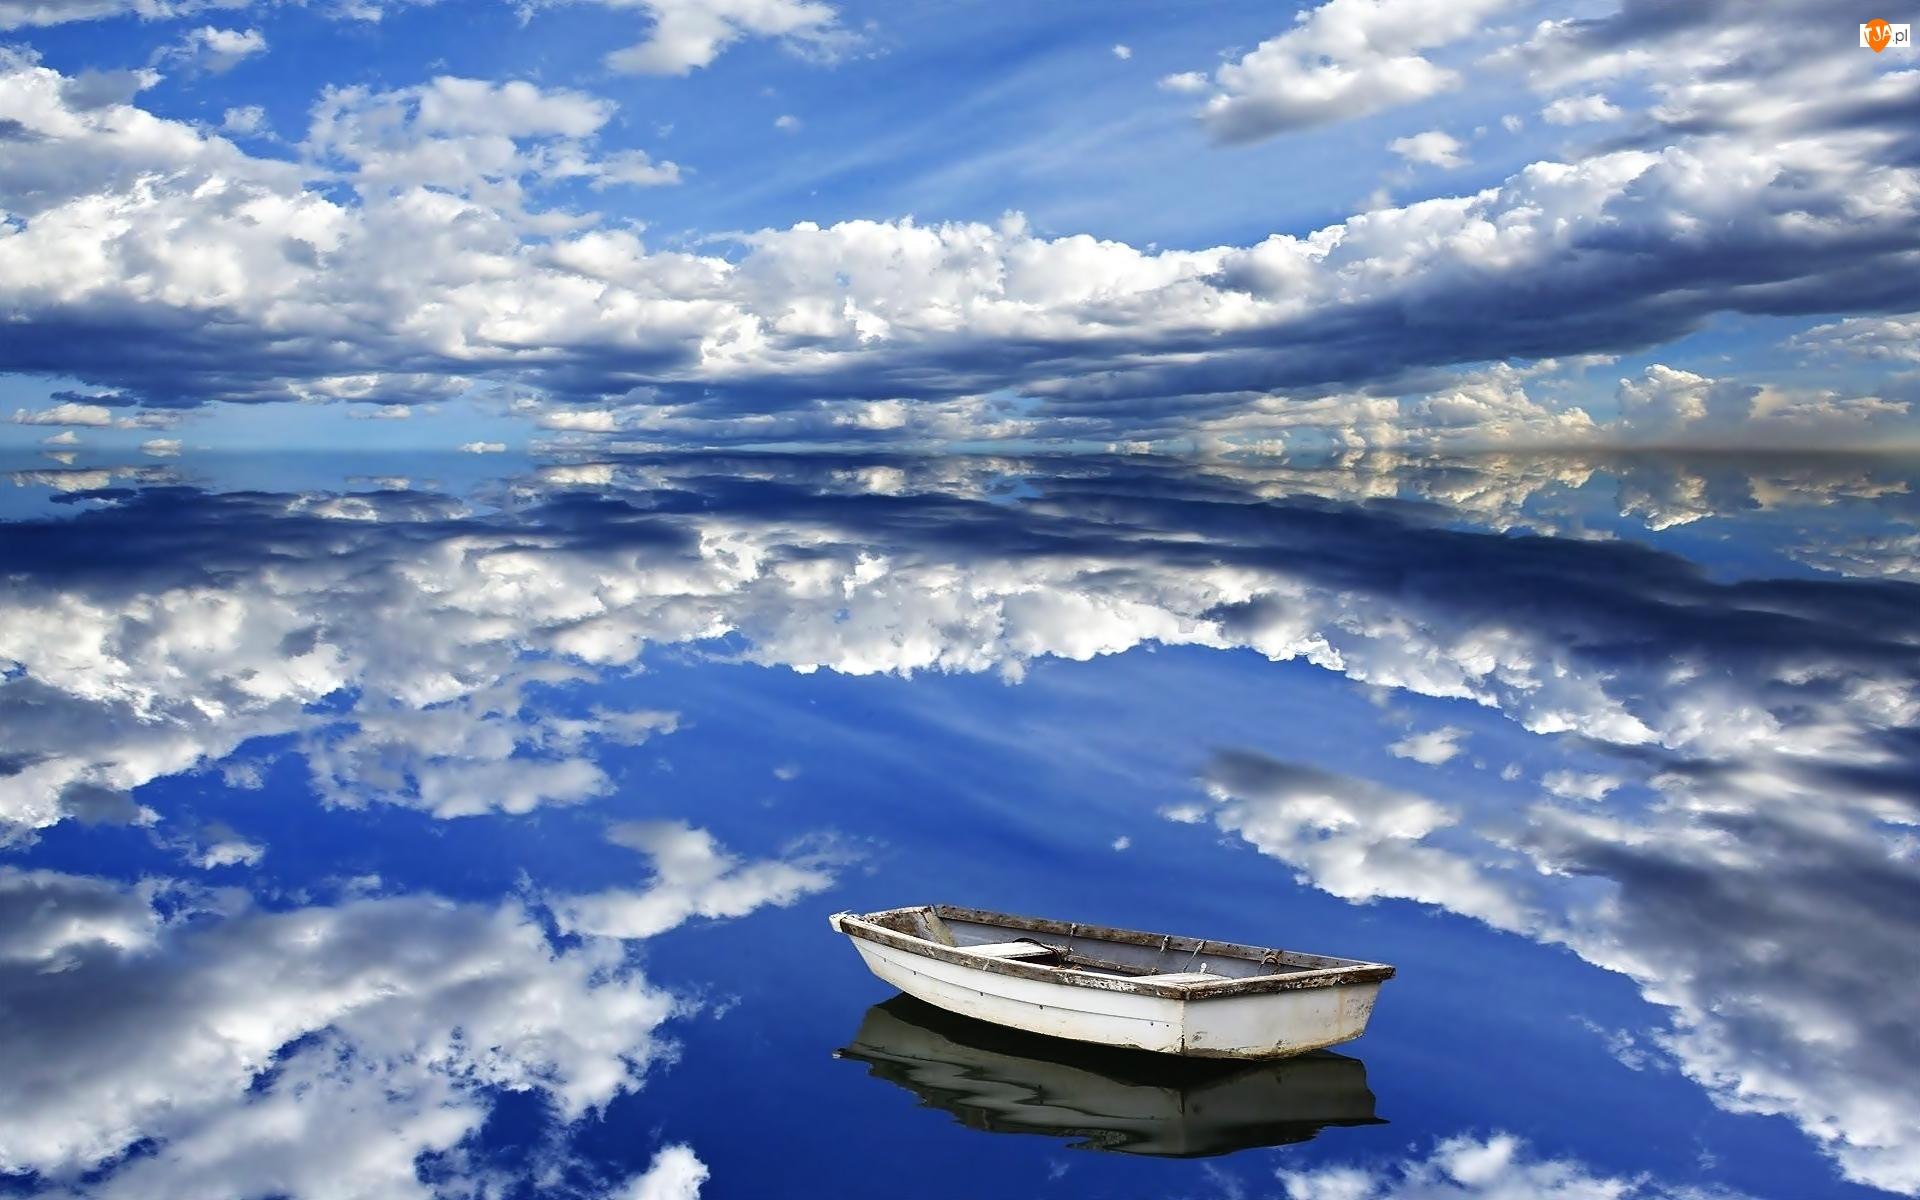 Odbicie, Chmury, Jezioro, Niebo, Łódka